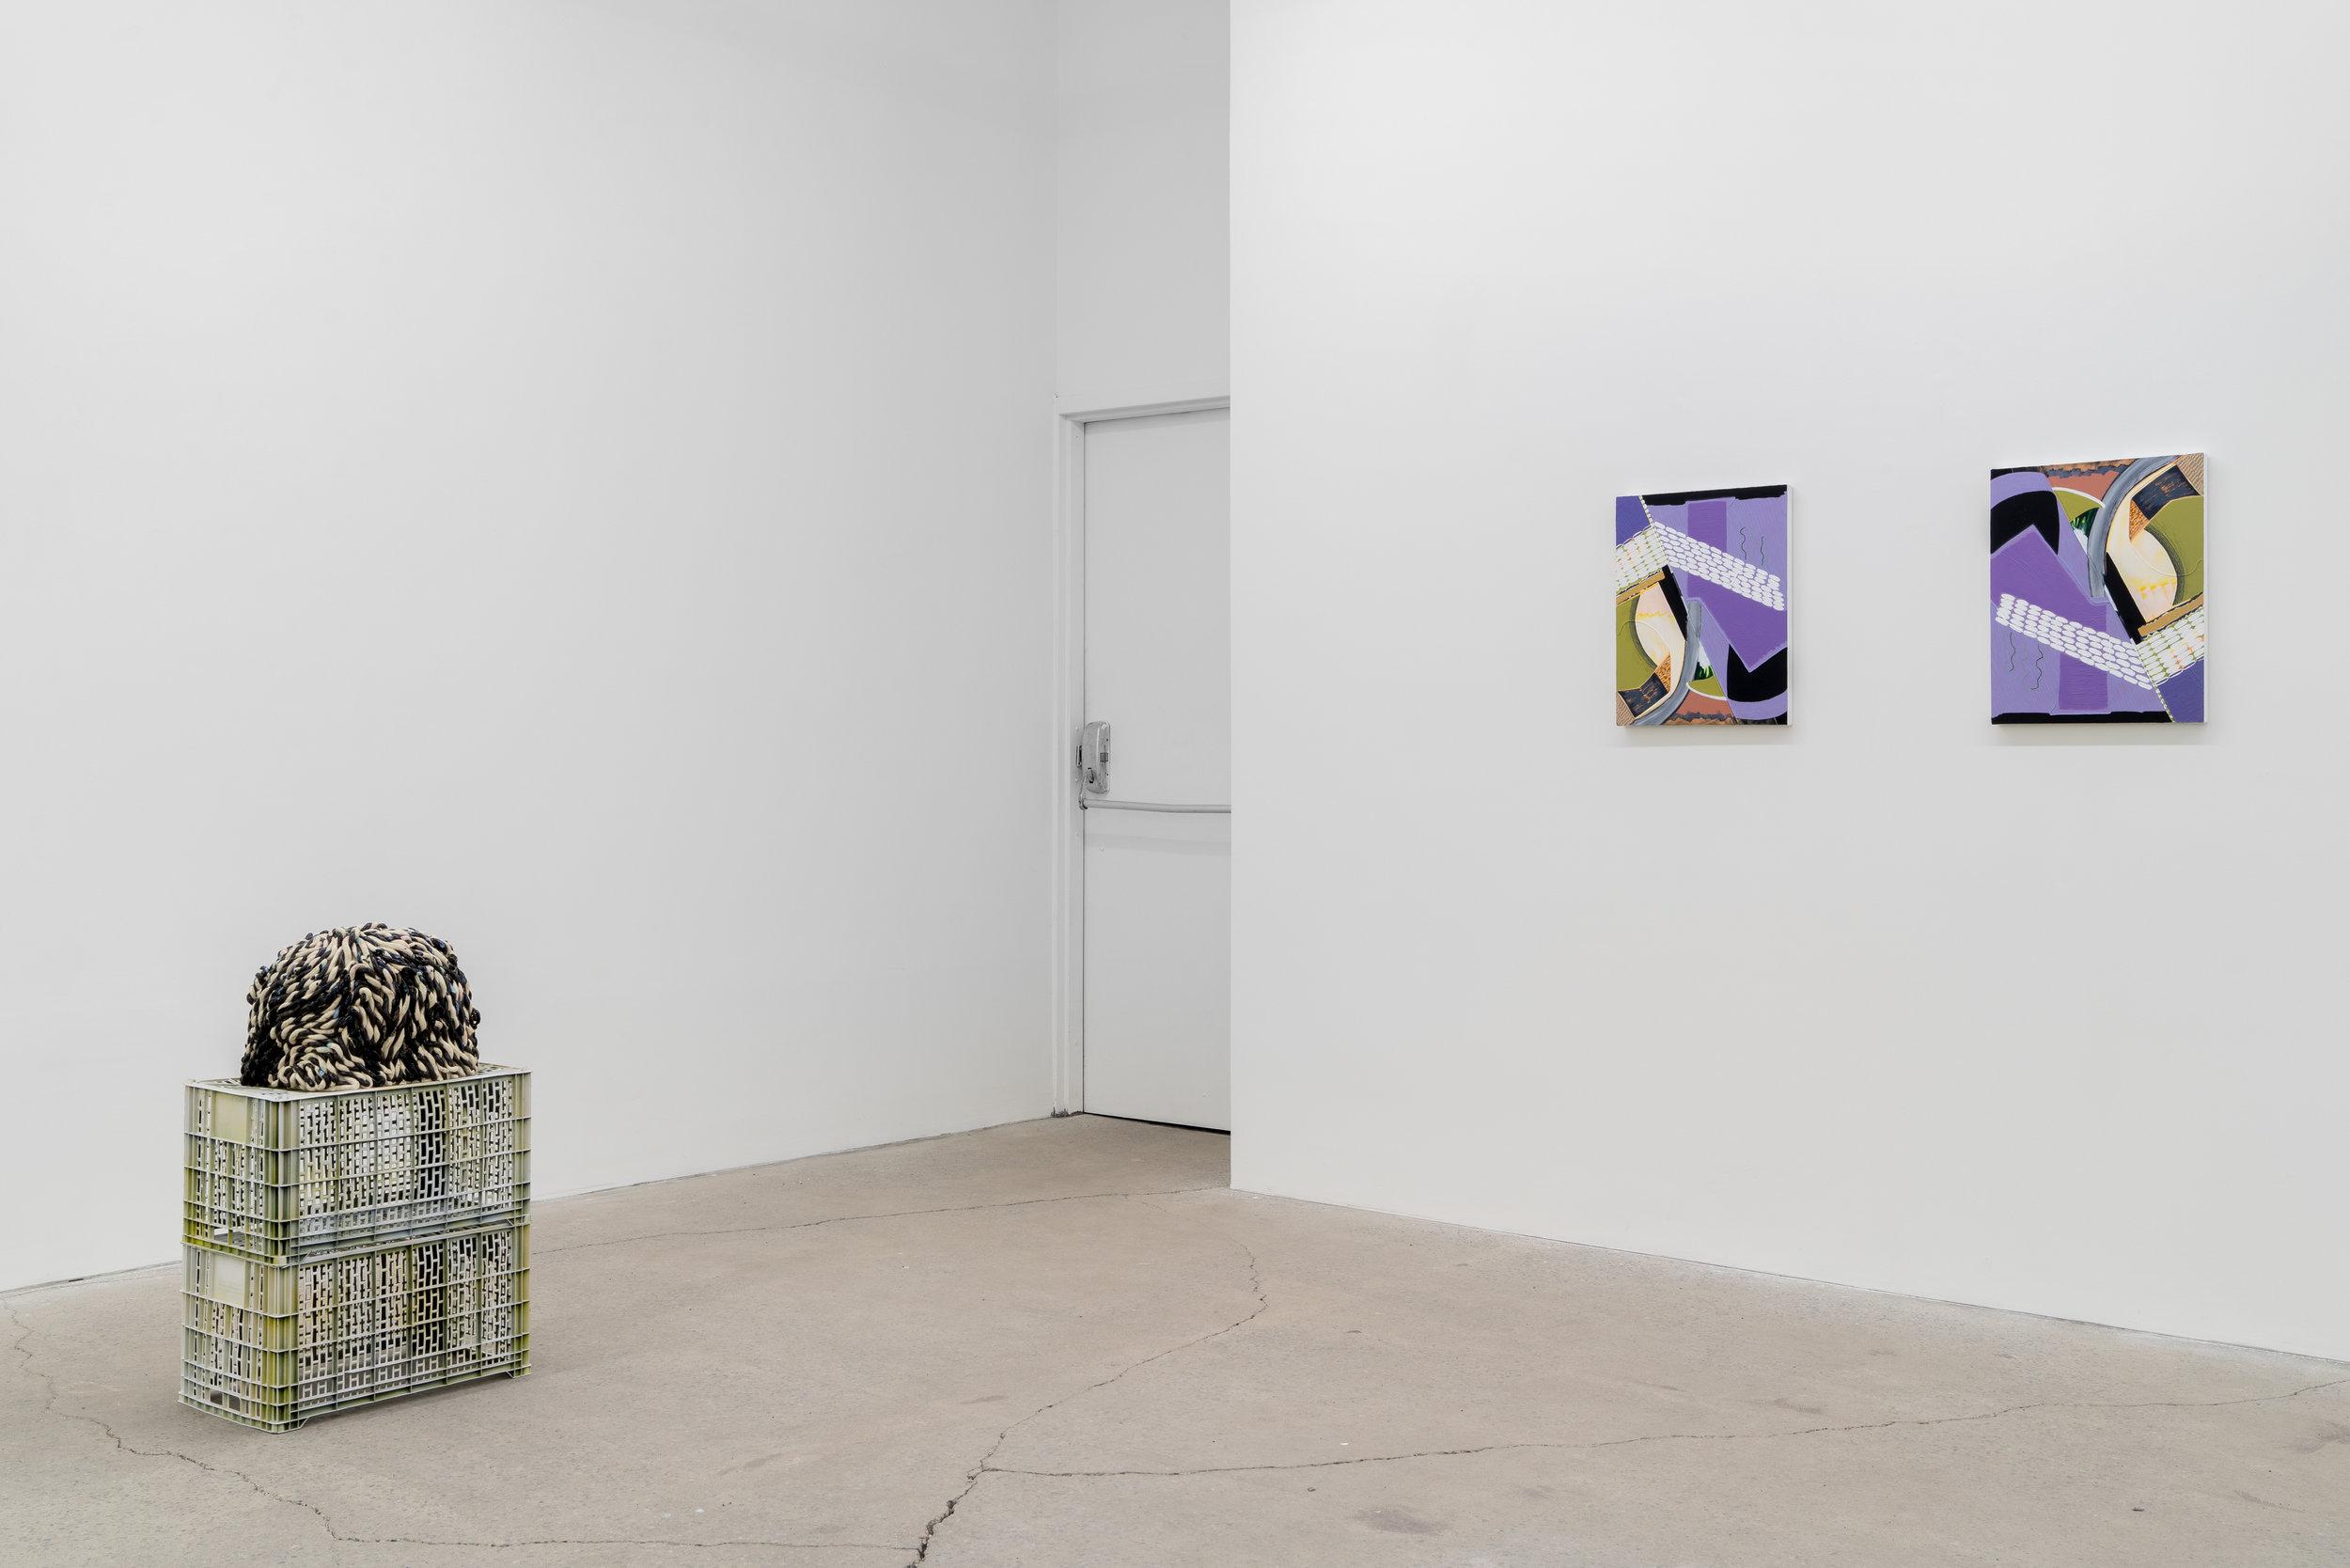 Magalie Guérin, 2019, exhibition view, Galerie Nicolas Robert, photo : Jean-Michael Seminaro